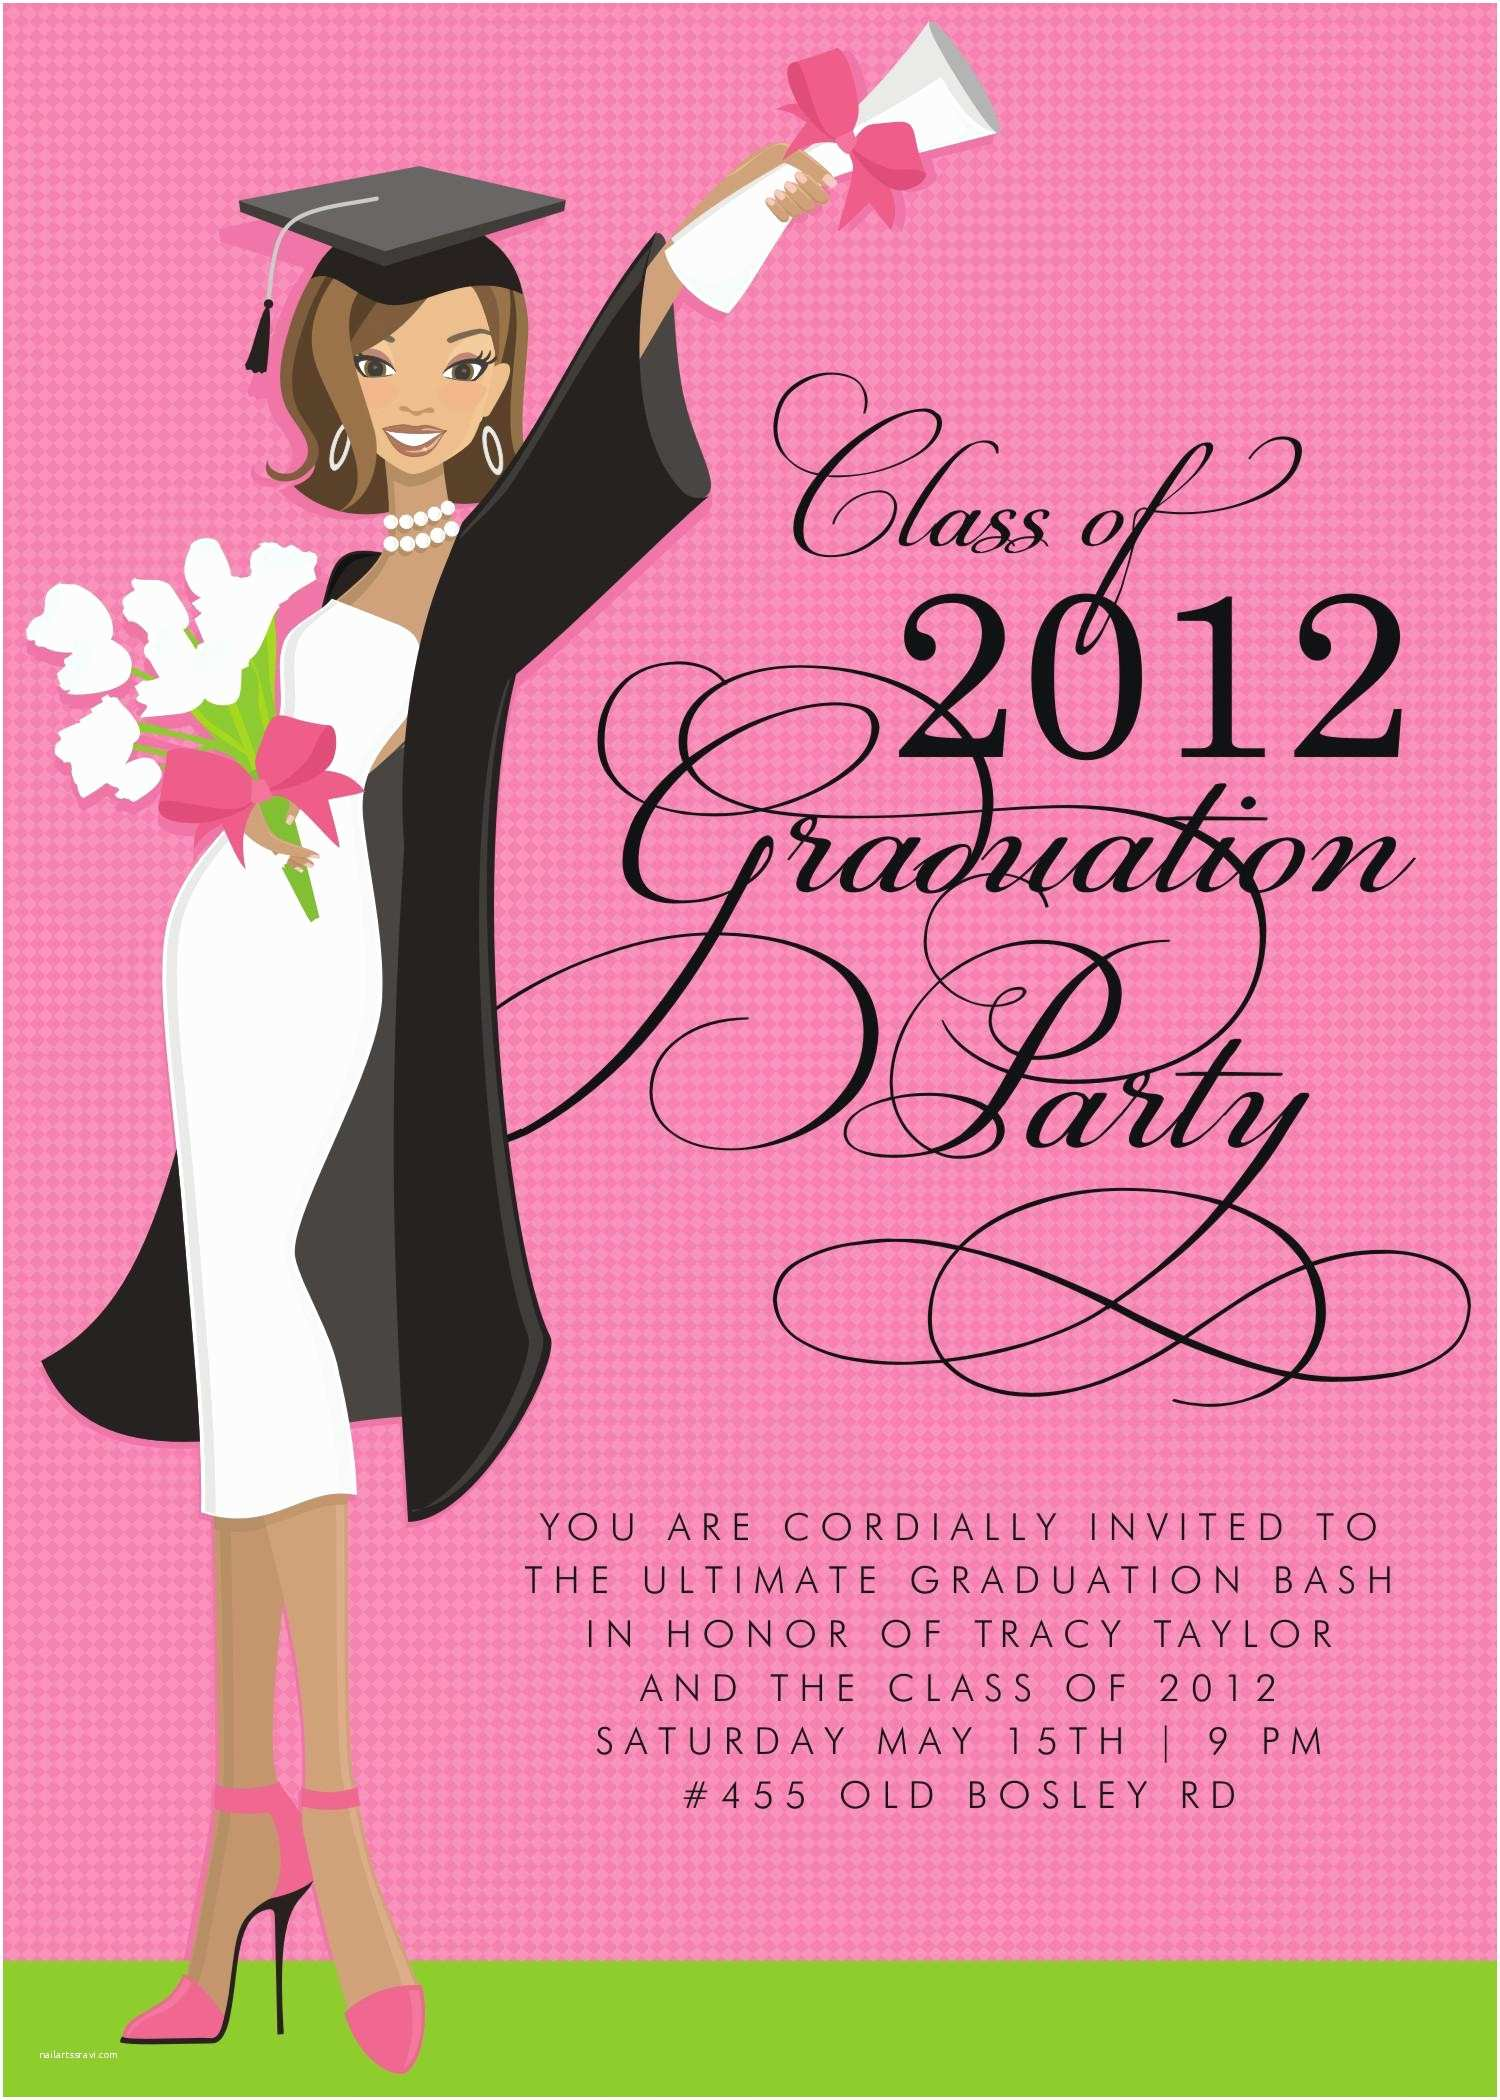 Graduation Invitations Graduation Invitations Graduation Invitations Wording